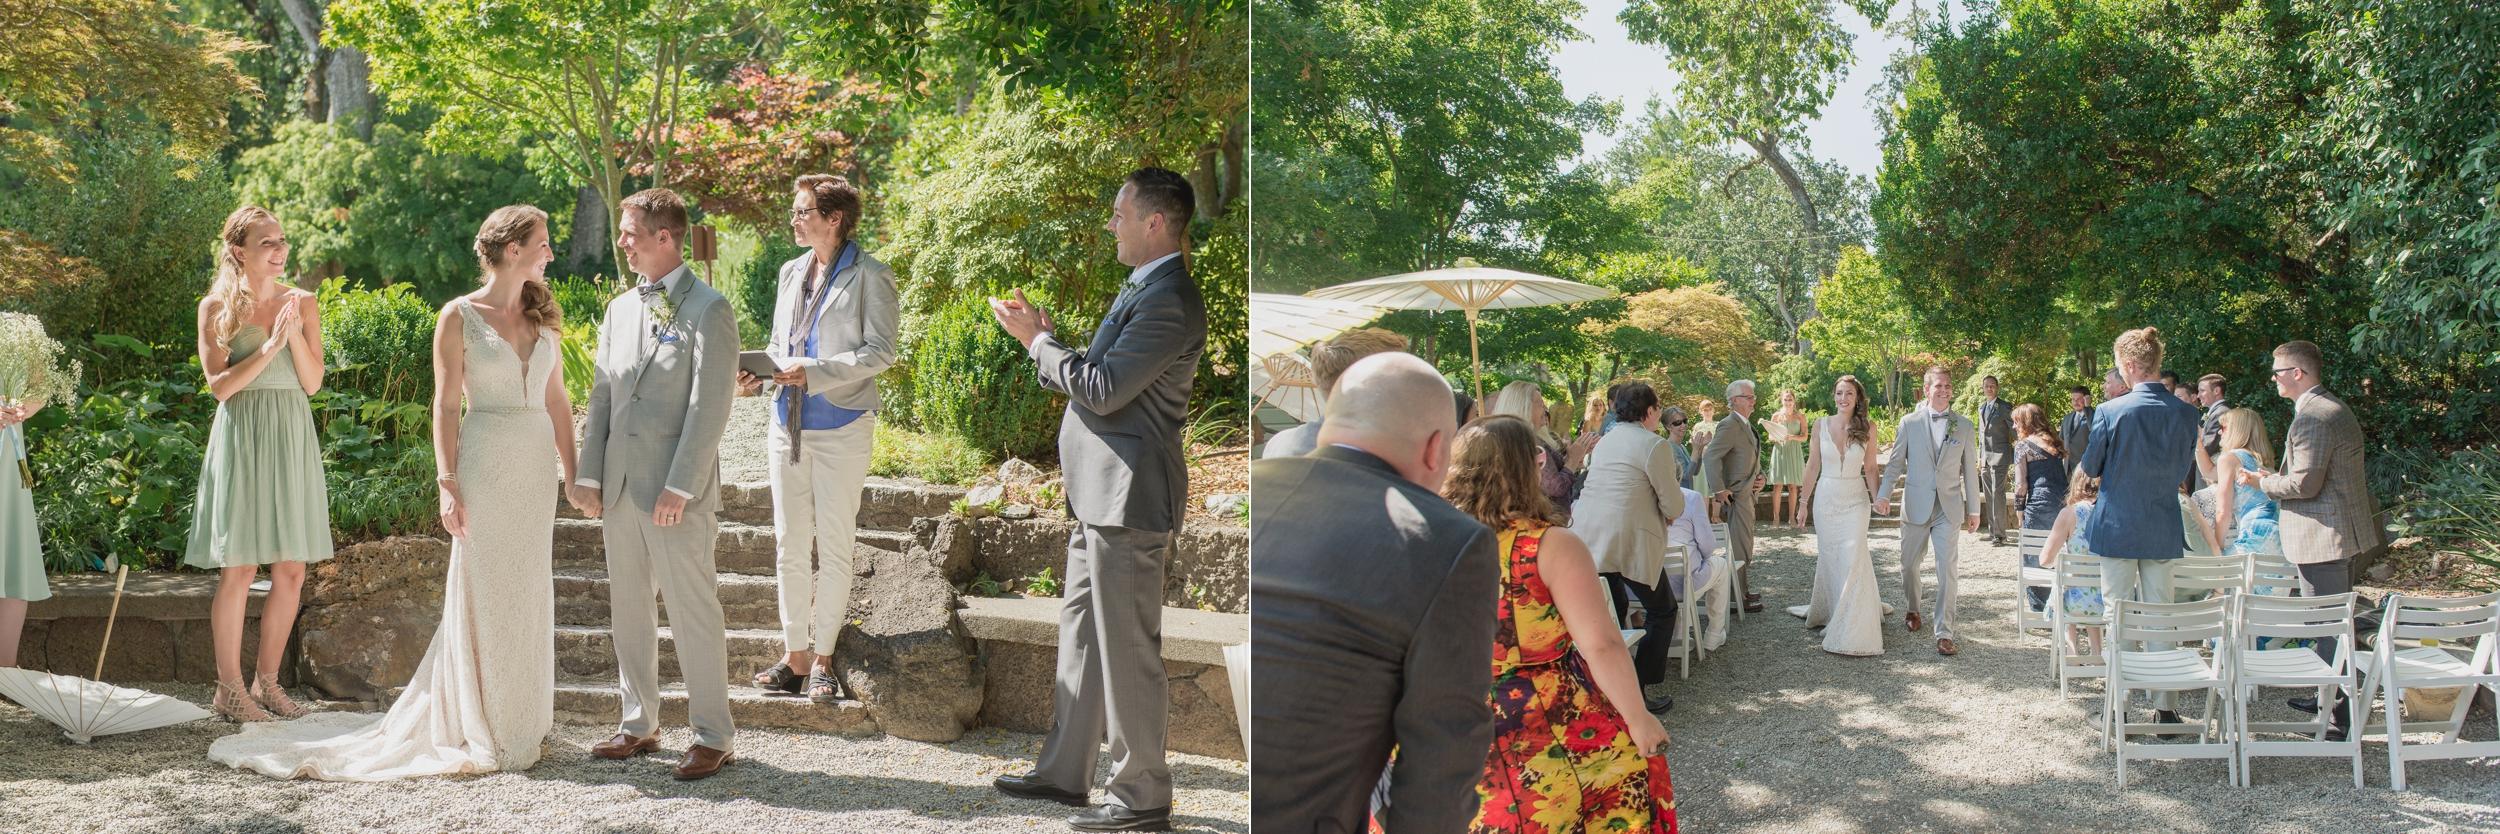 13-down-to-earth-marin-art-garden-center-wedding-vivianchen.jpg